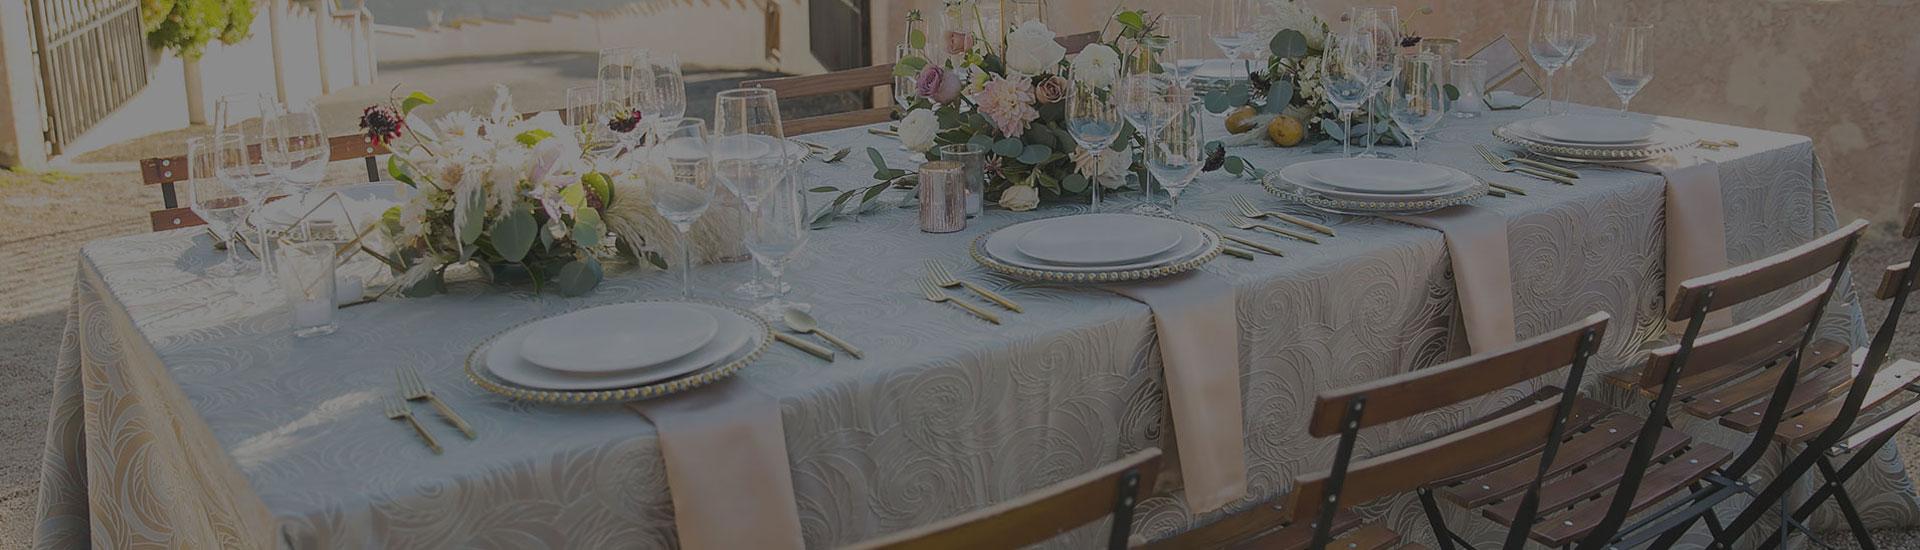 Table-Linen-Rental